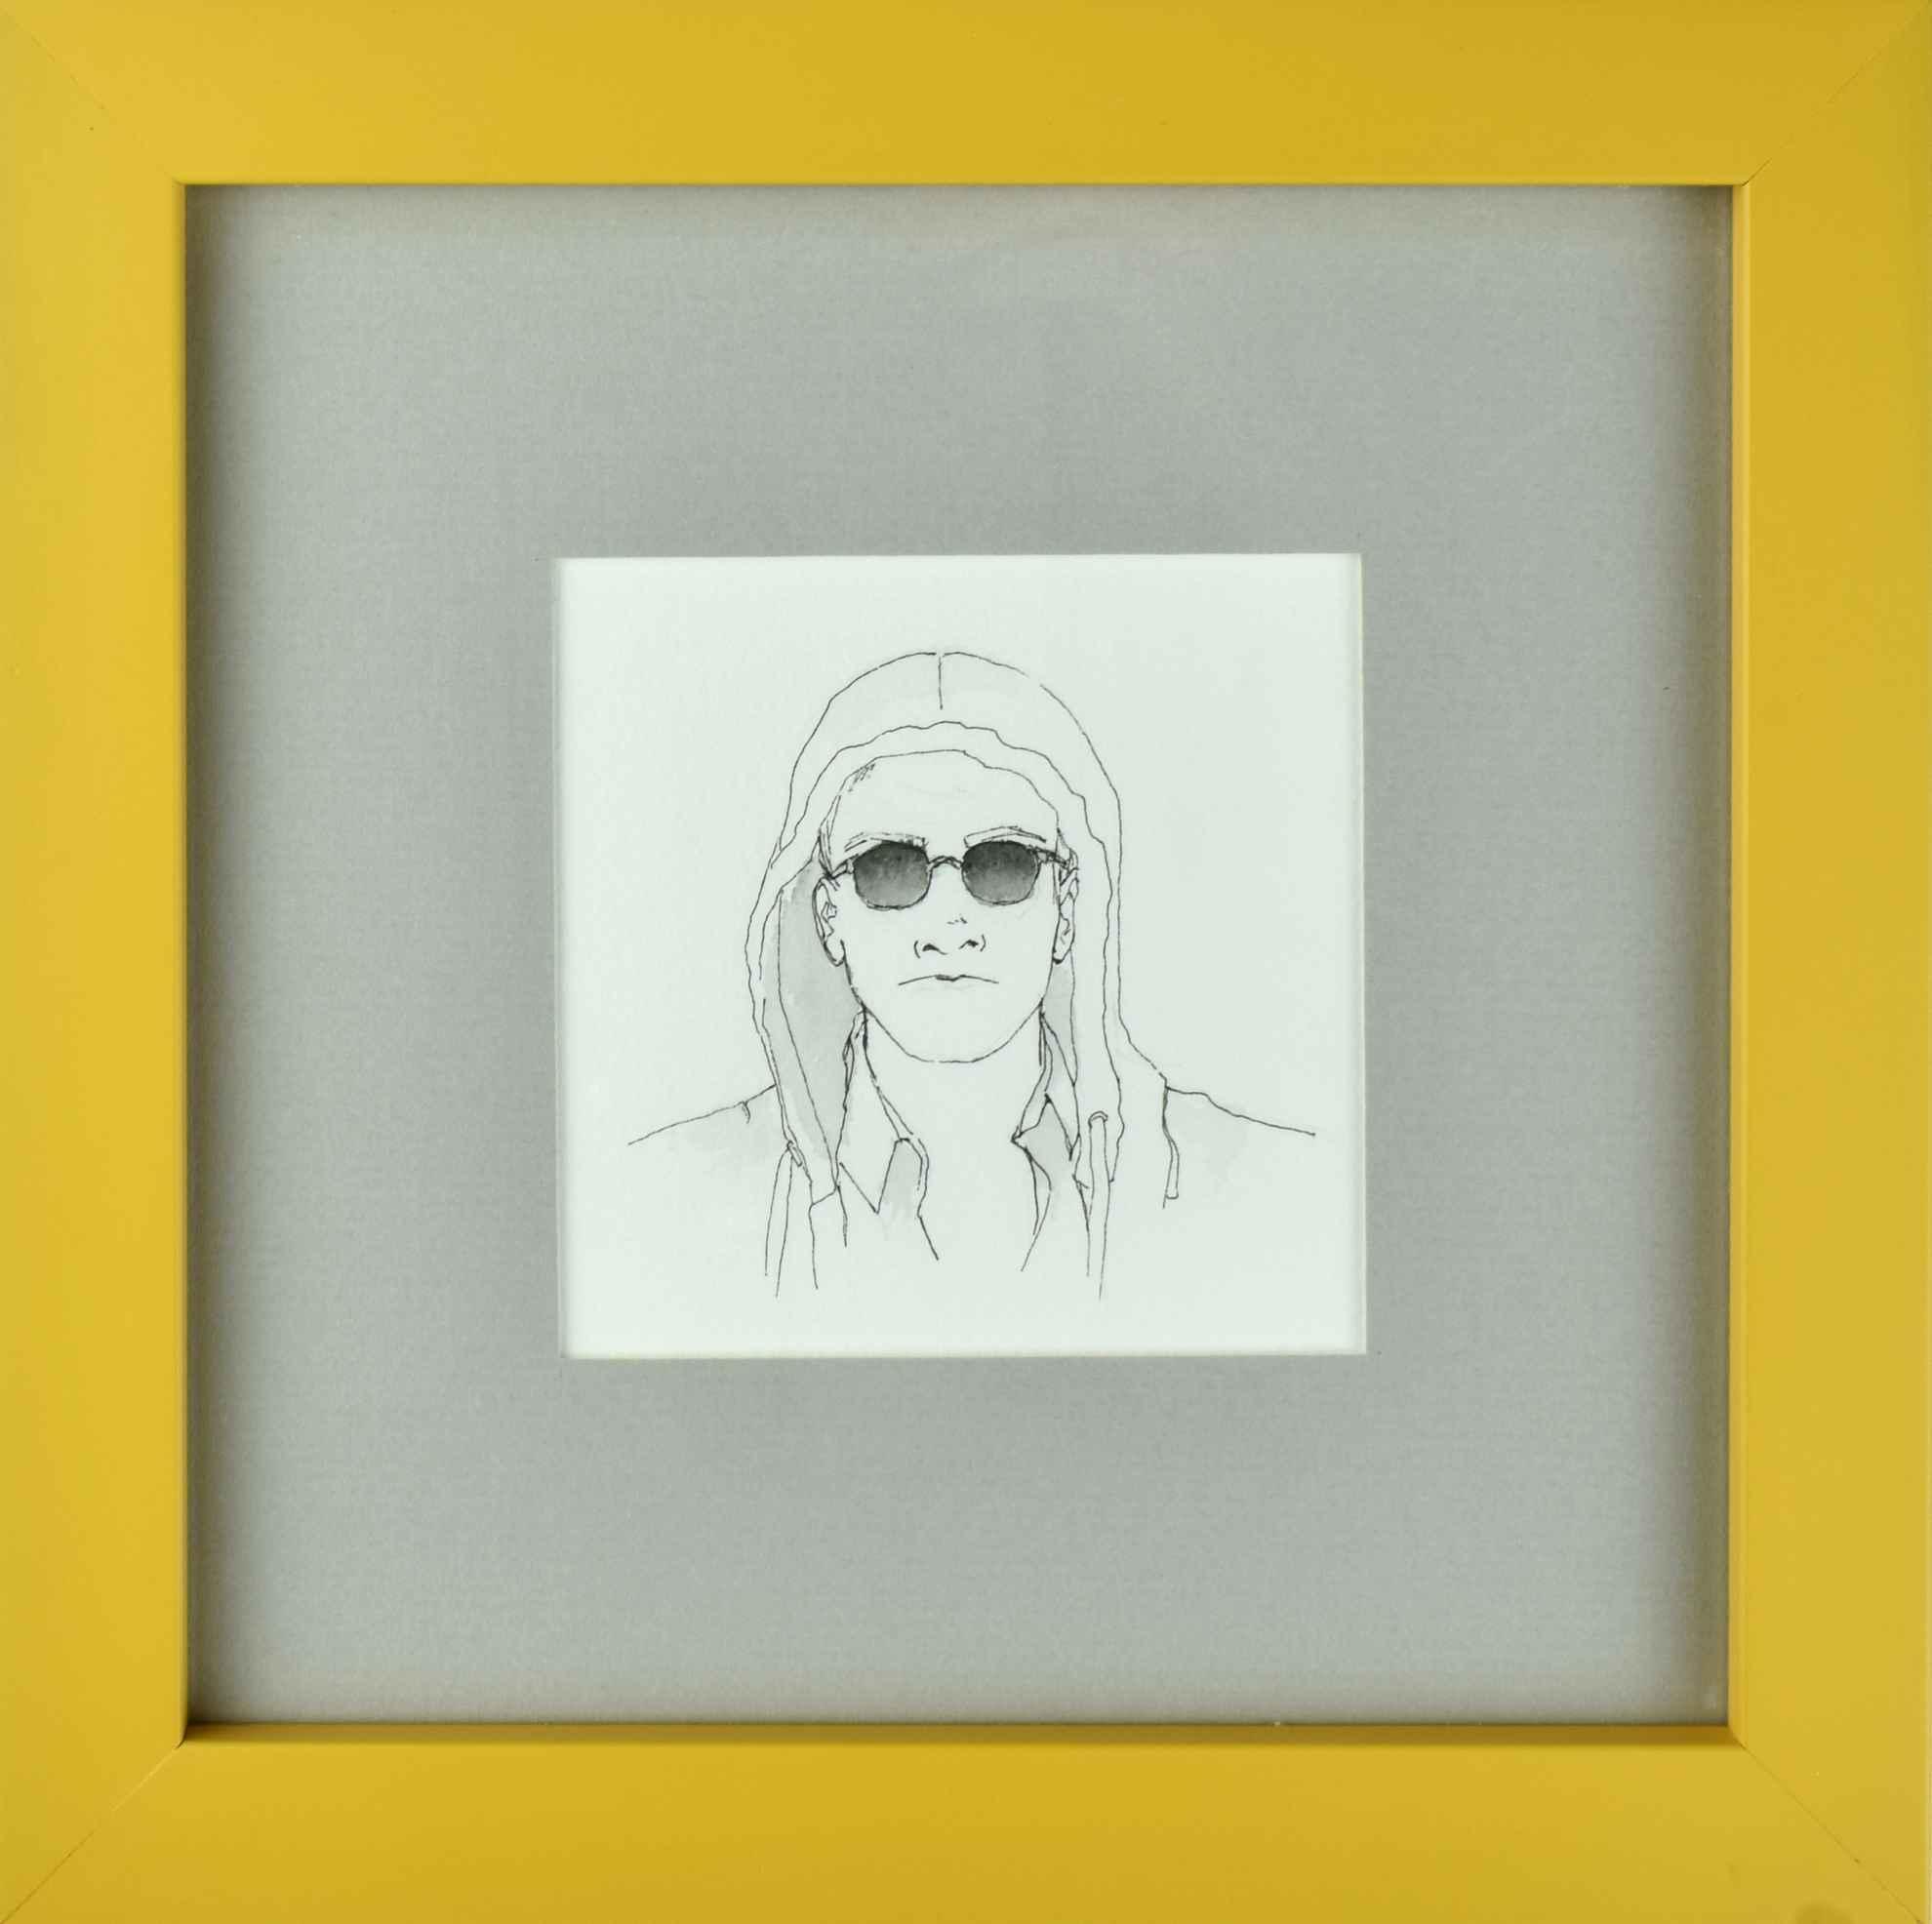 Sunglasses 2 by  Jill Hakala - Masterpiece Online